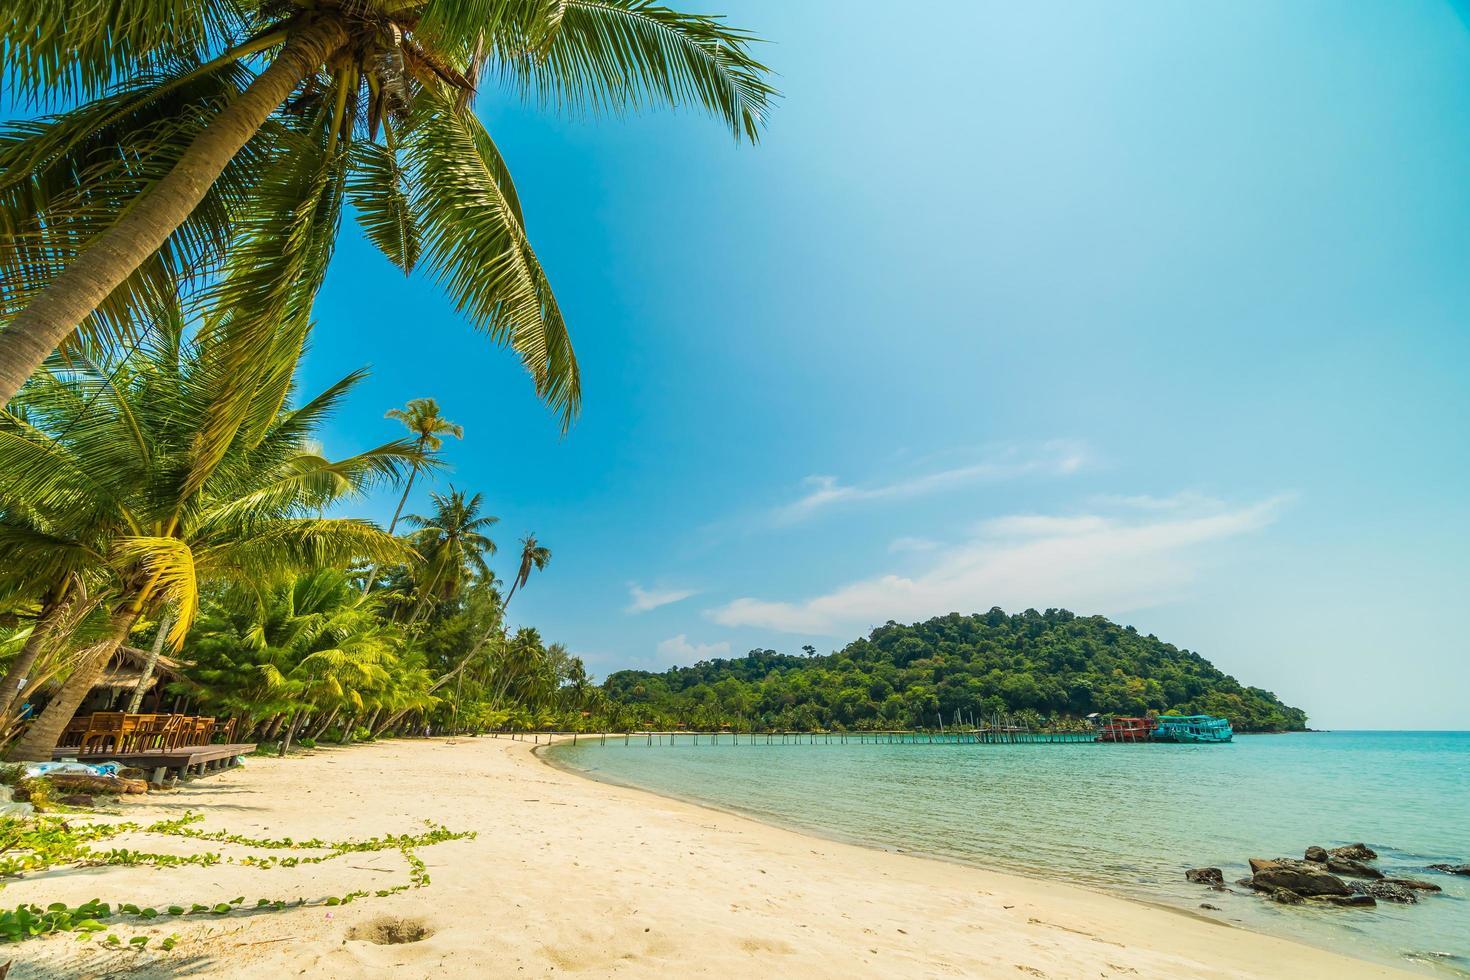 Beautiful tropical beach and sea photo